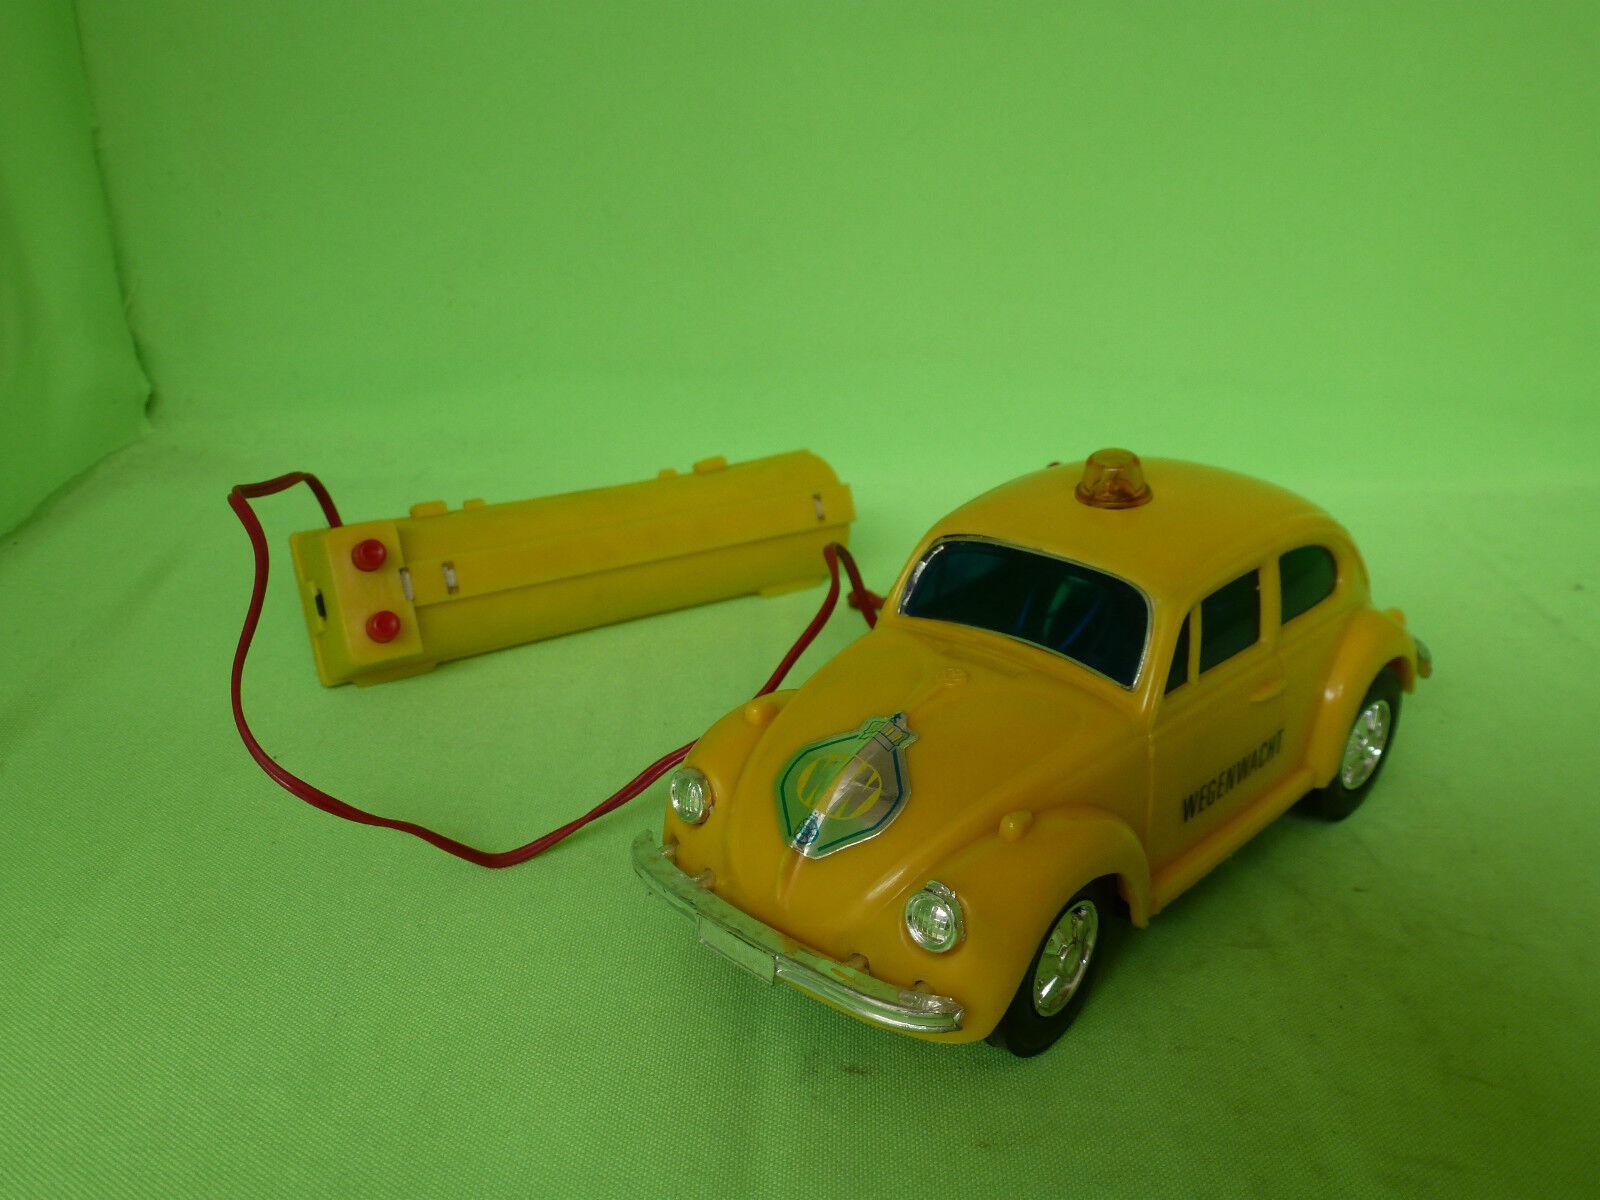 MADE IN JAPAN BEETLE  VW VOLKSWAGEN  1 24  ANWB  WEGENWACHT  PLASTIK